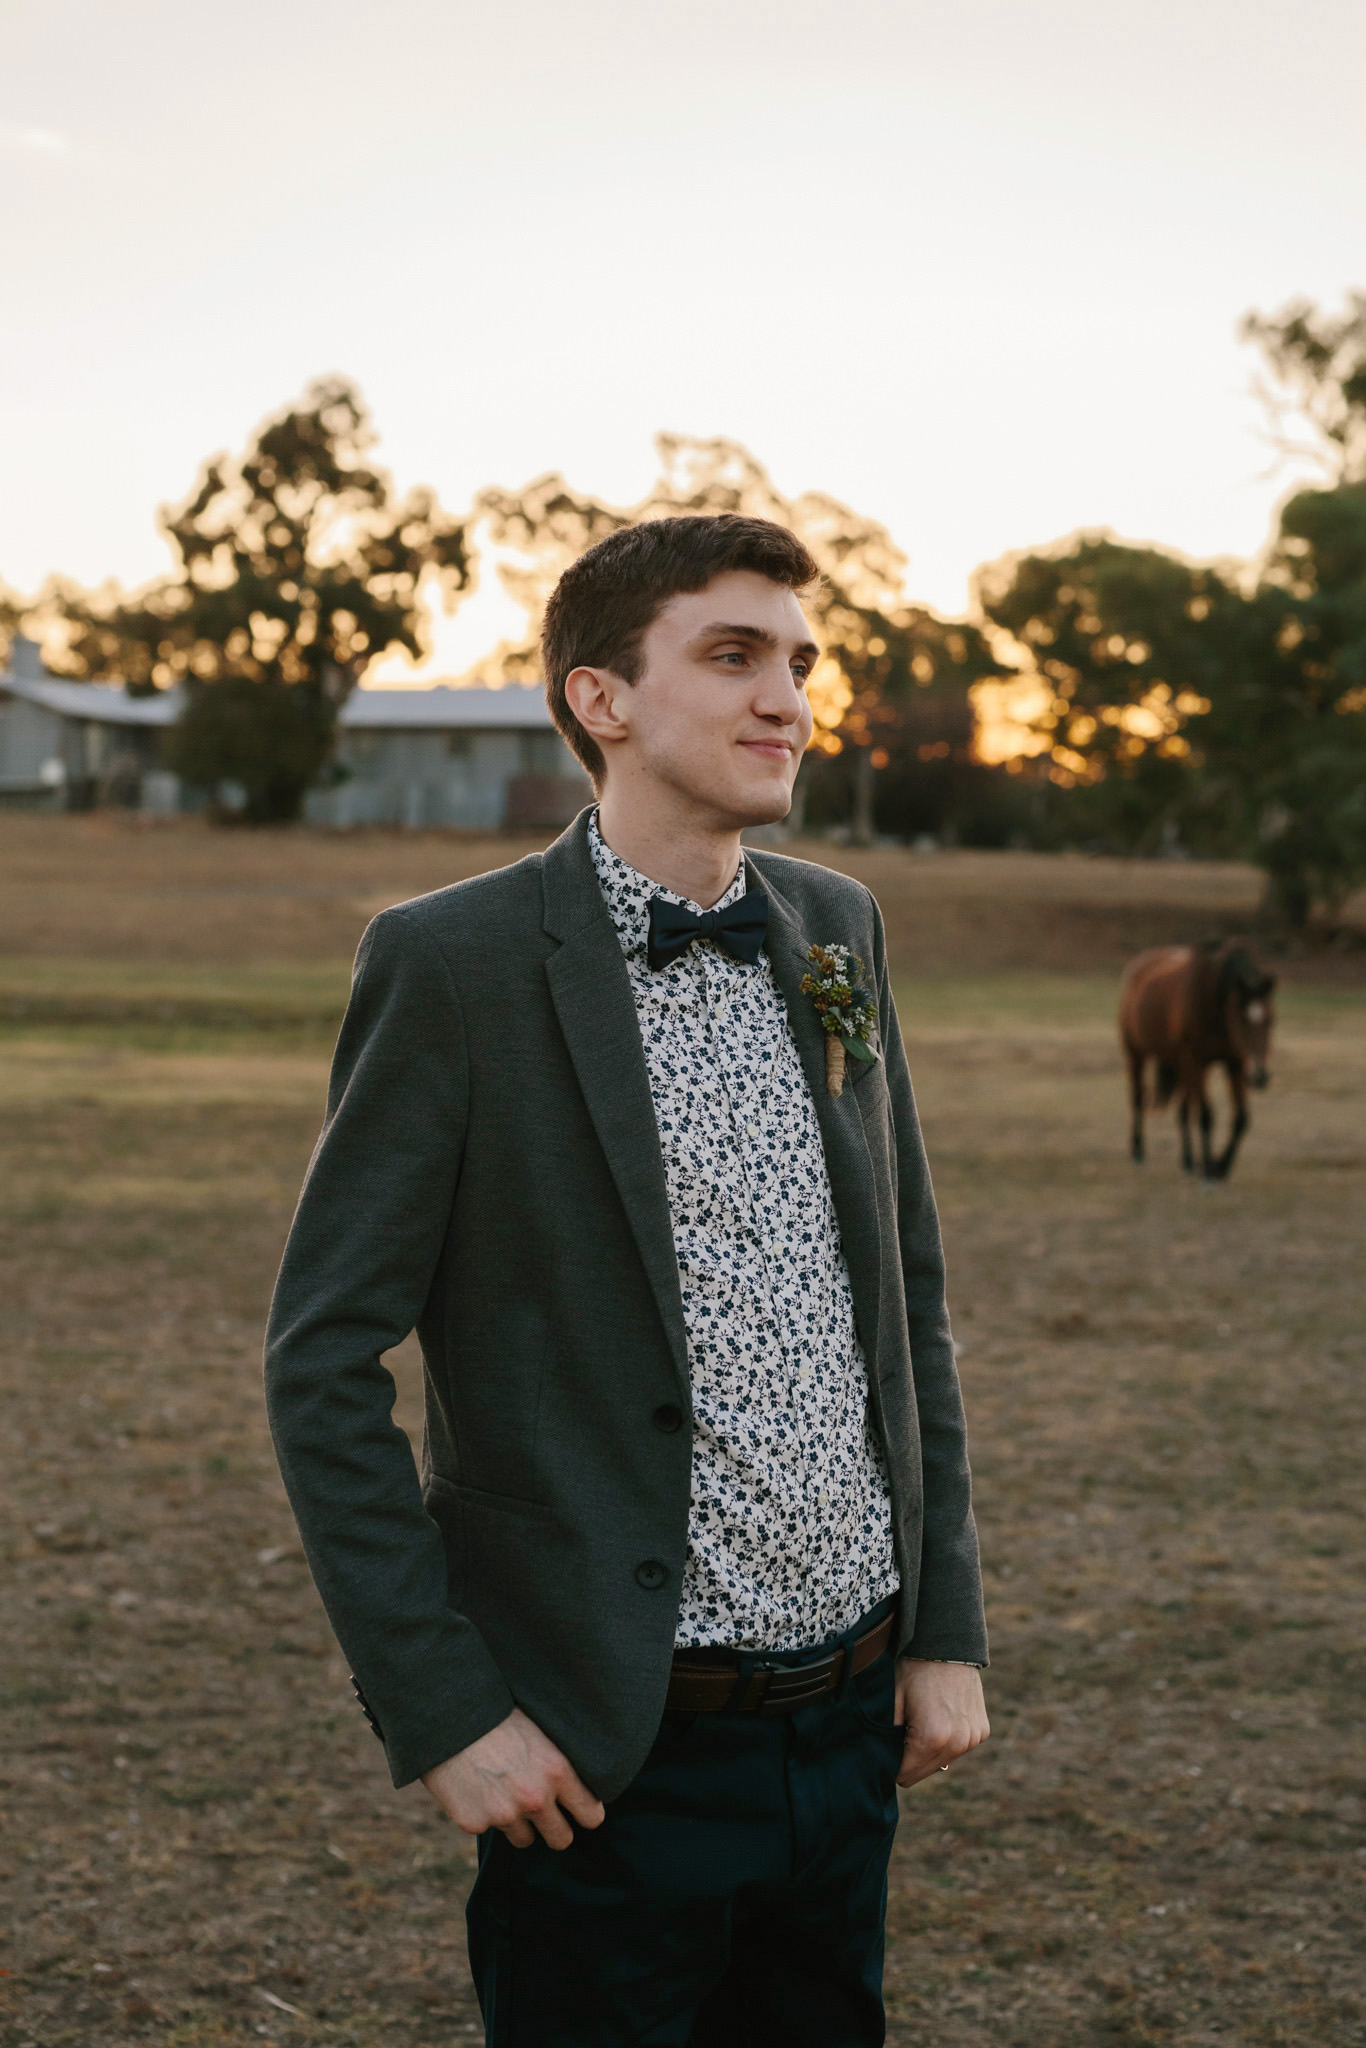 Erin_Latimore_Mudgee_Canberra_Wedding_Photographer_Tuggeranong_Homestead_511.JPG